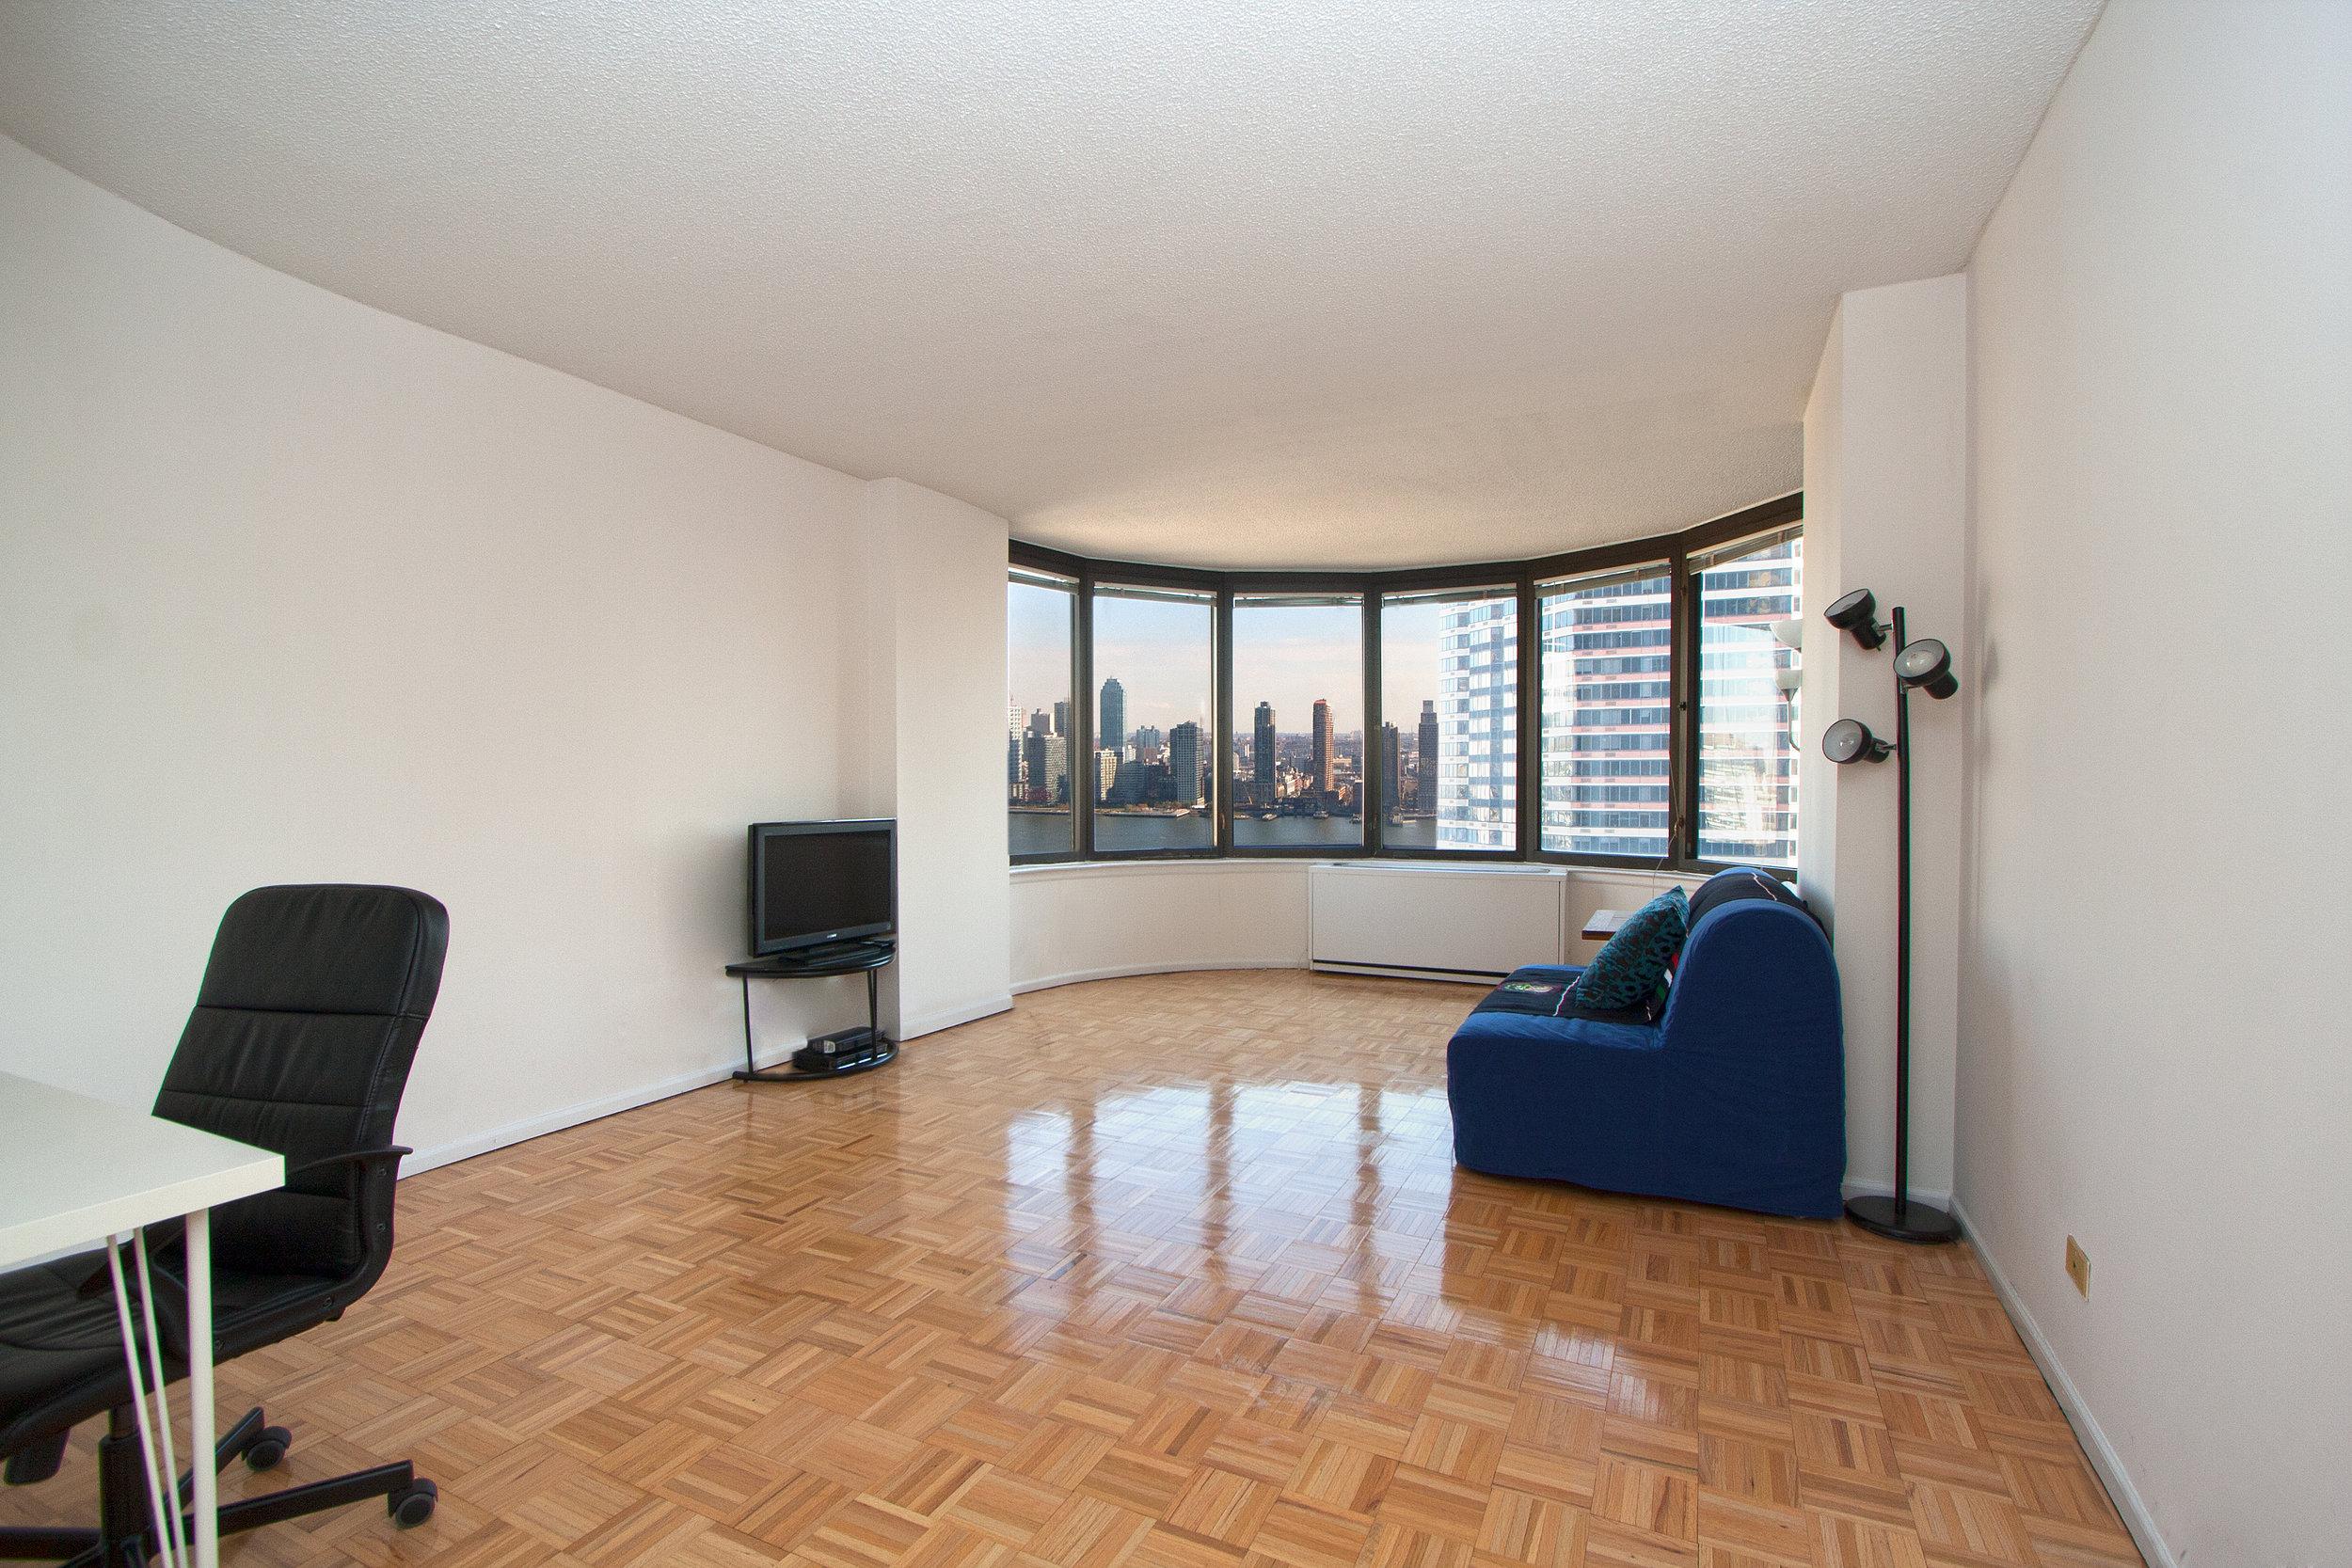 East_38th_Street_330_38M_Living_Room_.jpg